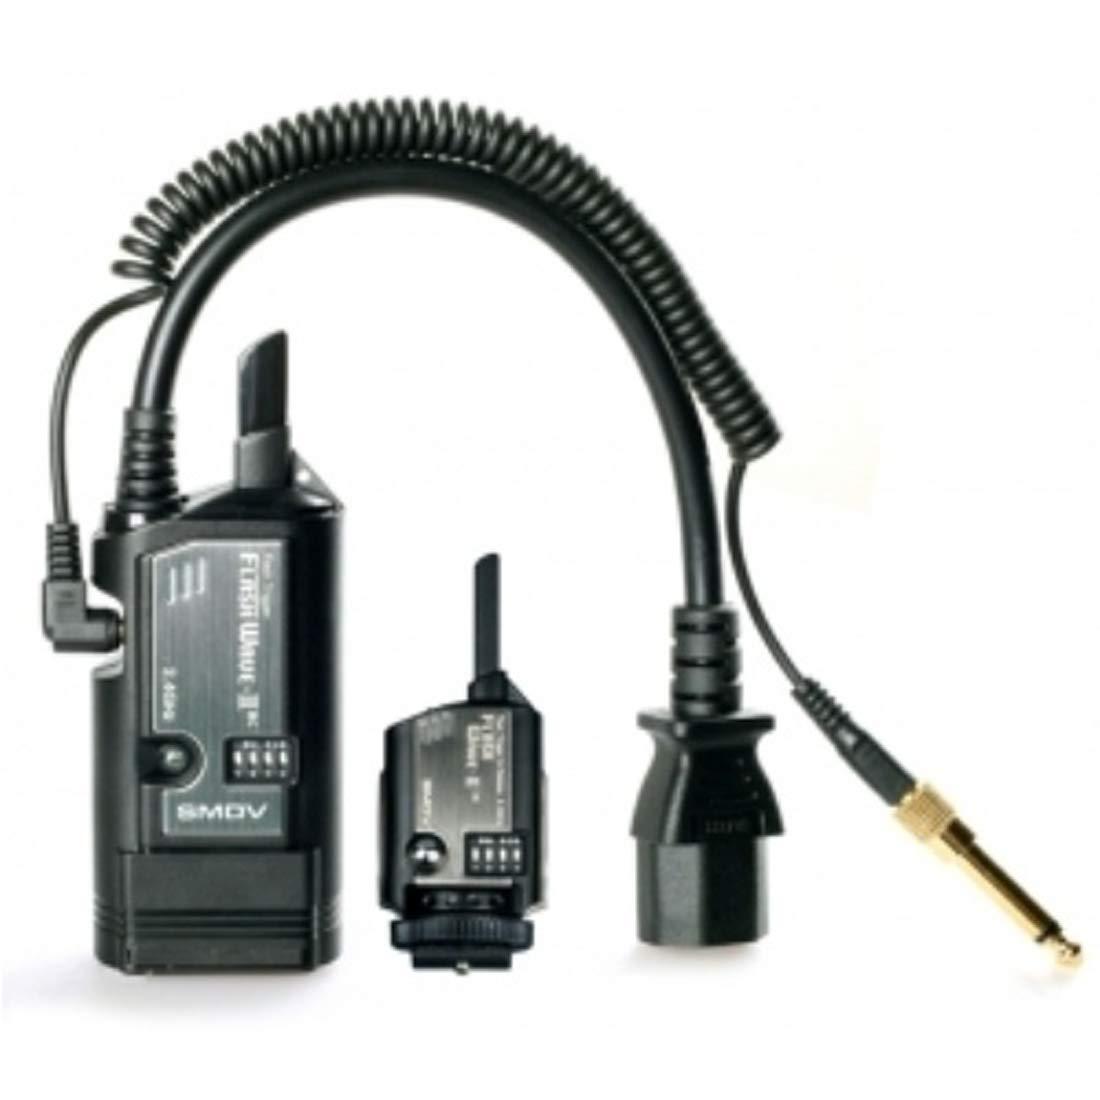 SMDV FlashWave III デジタルラジオ スレーブワイヤレスリモートトリガーシャッターレリーズ   B07NZ33XPR